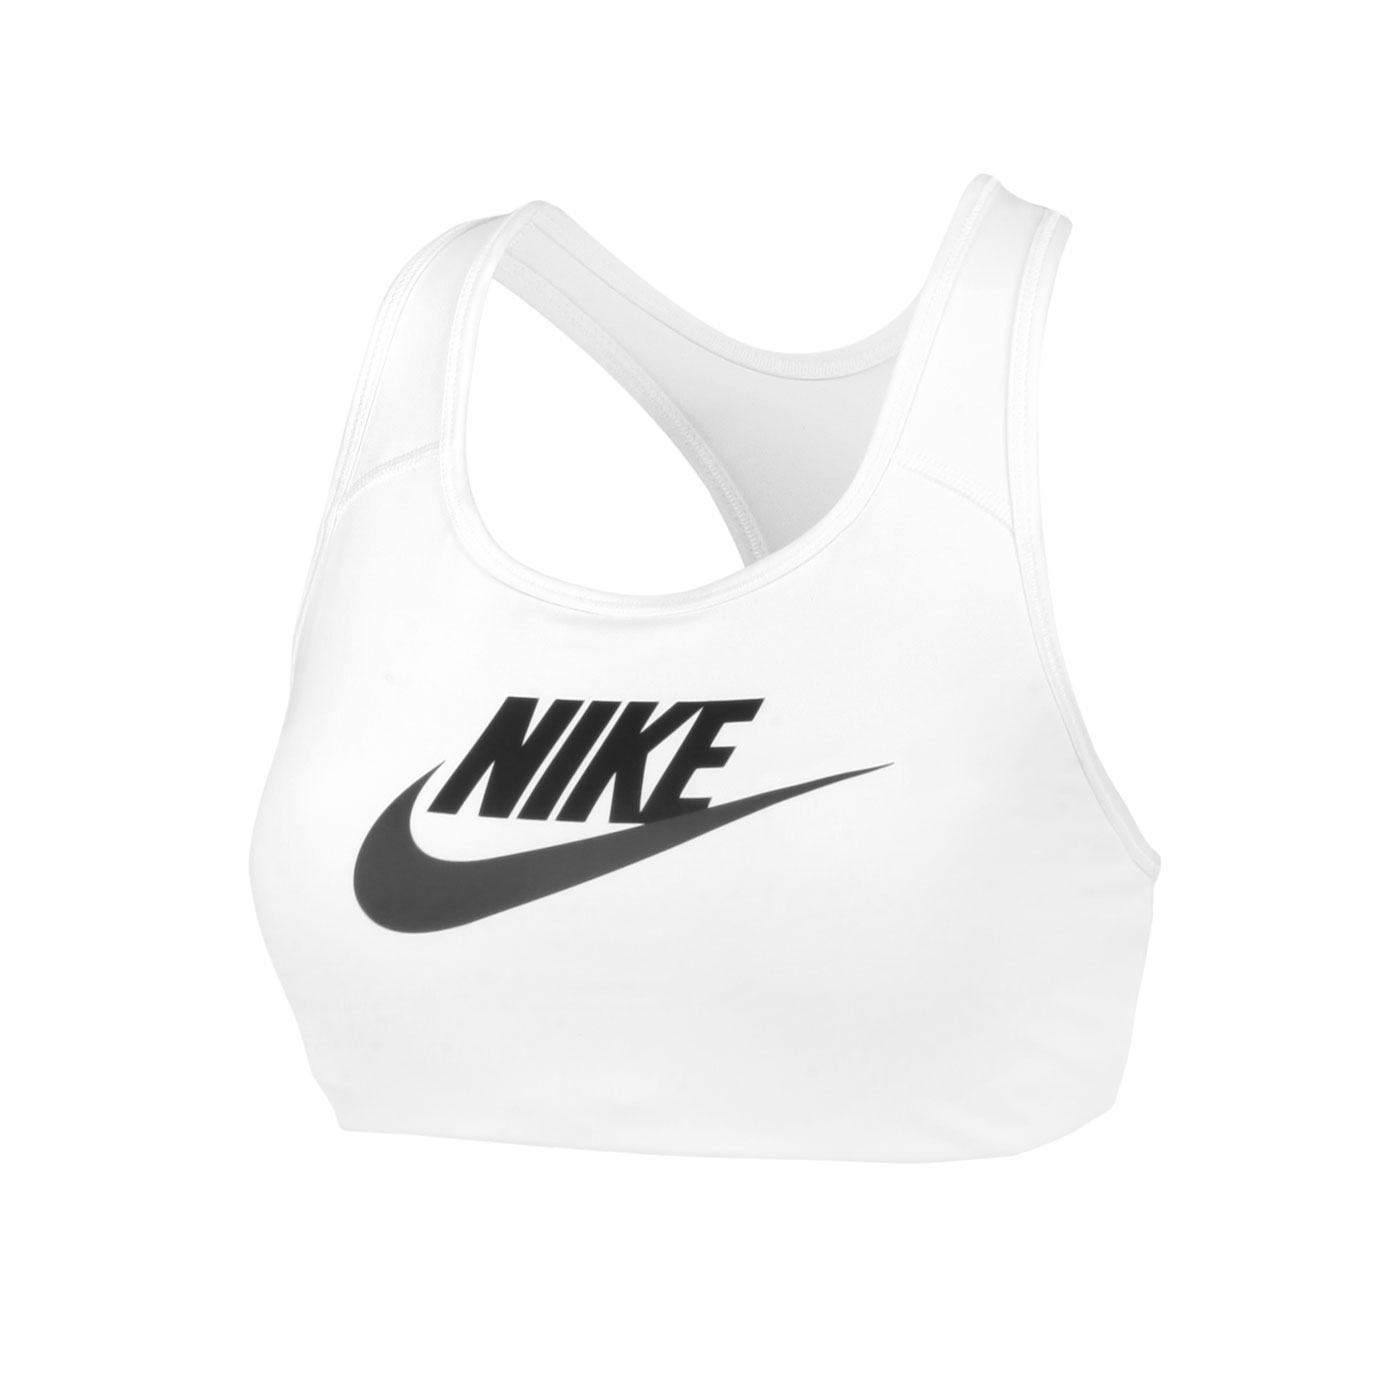 NIKE 女款運動內衣 DM0580-100